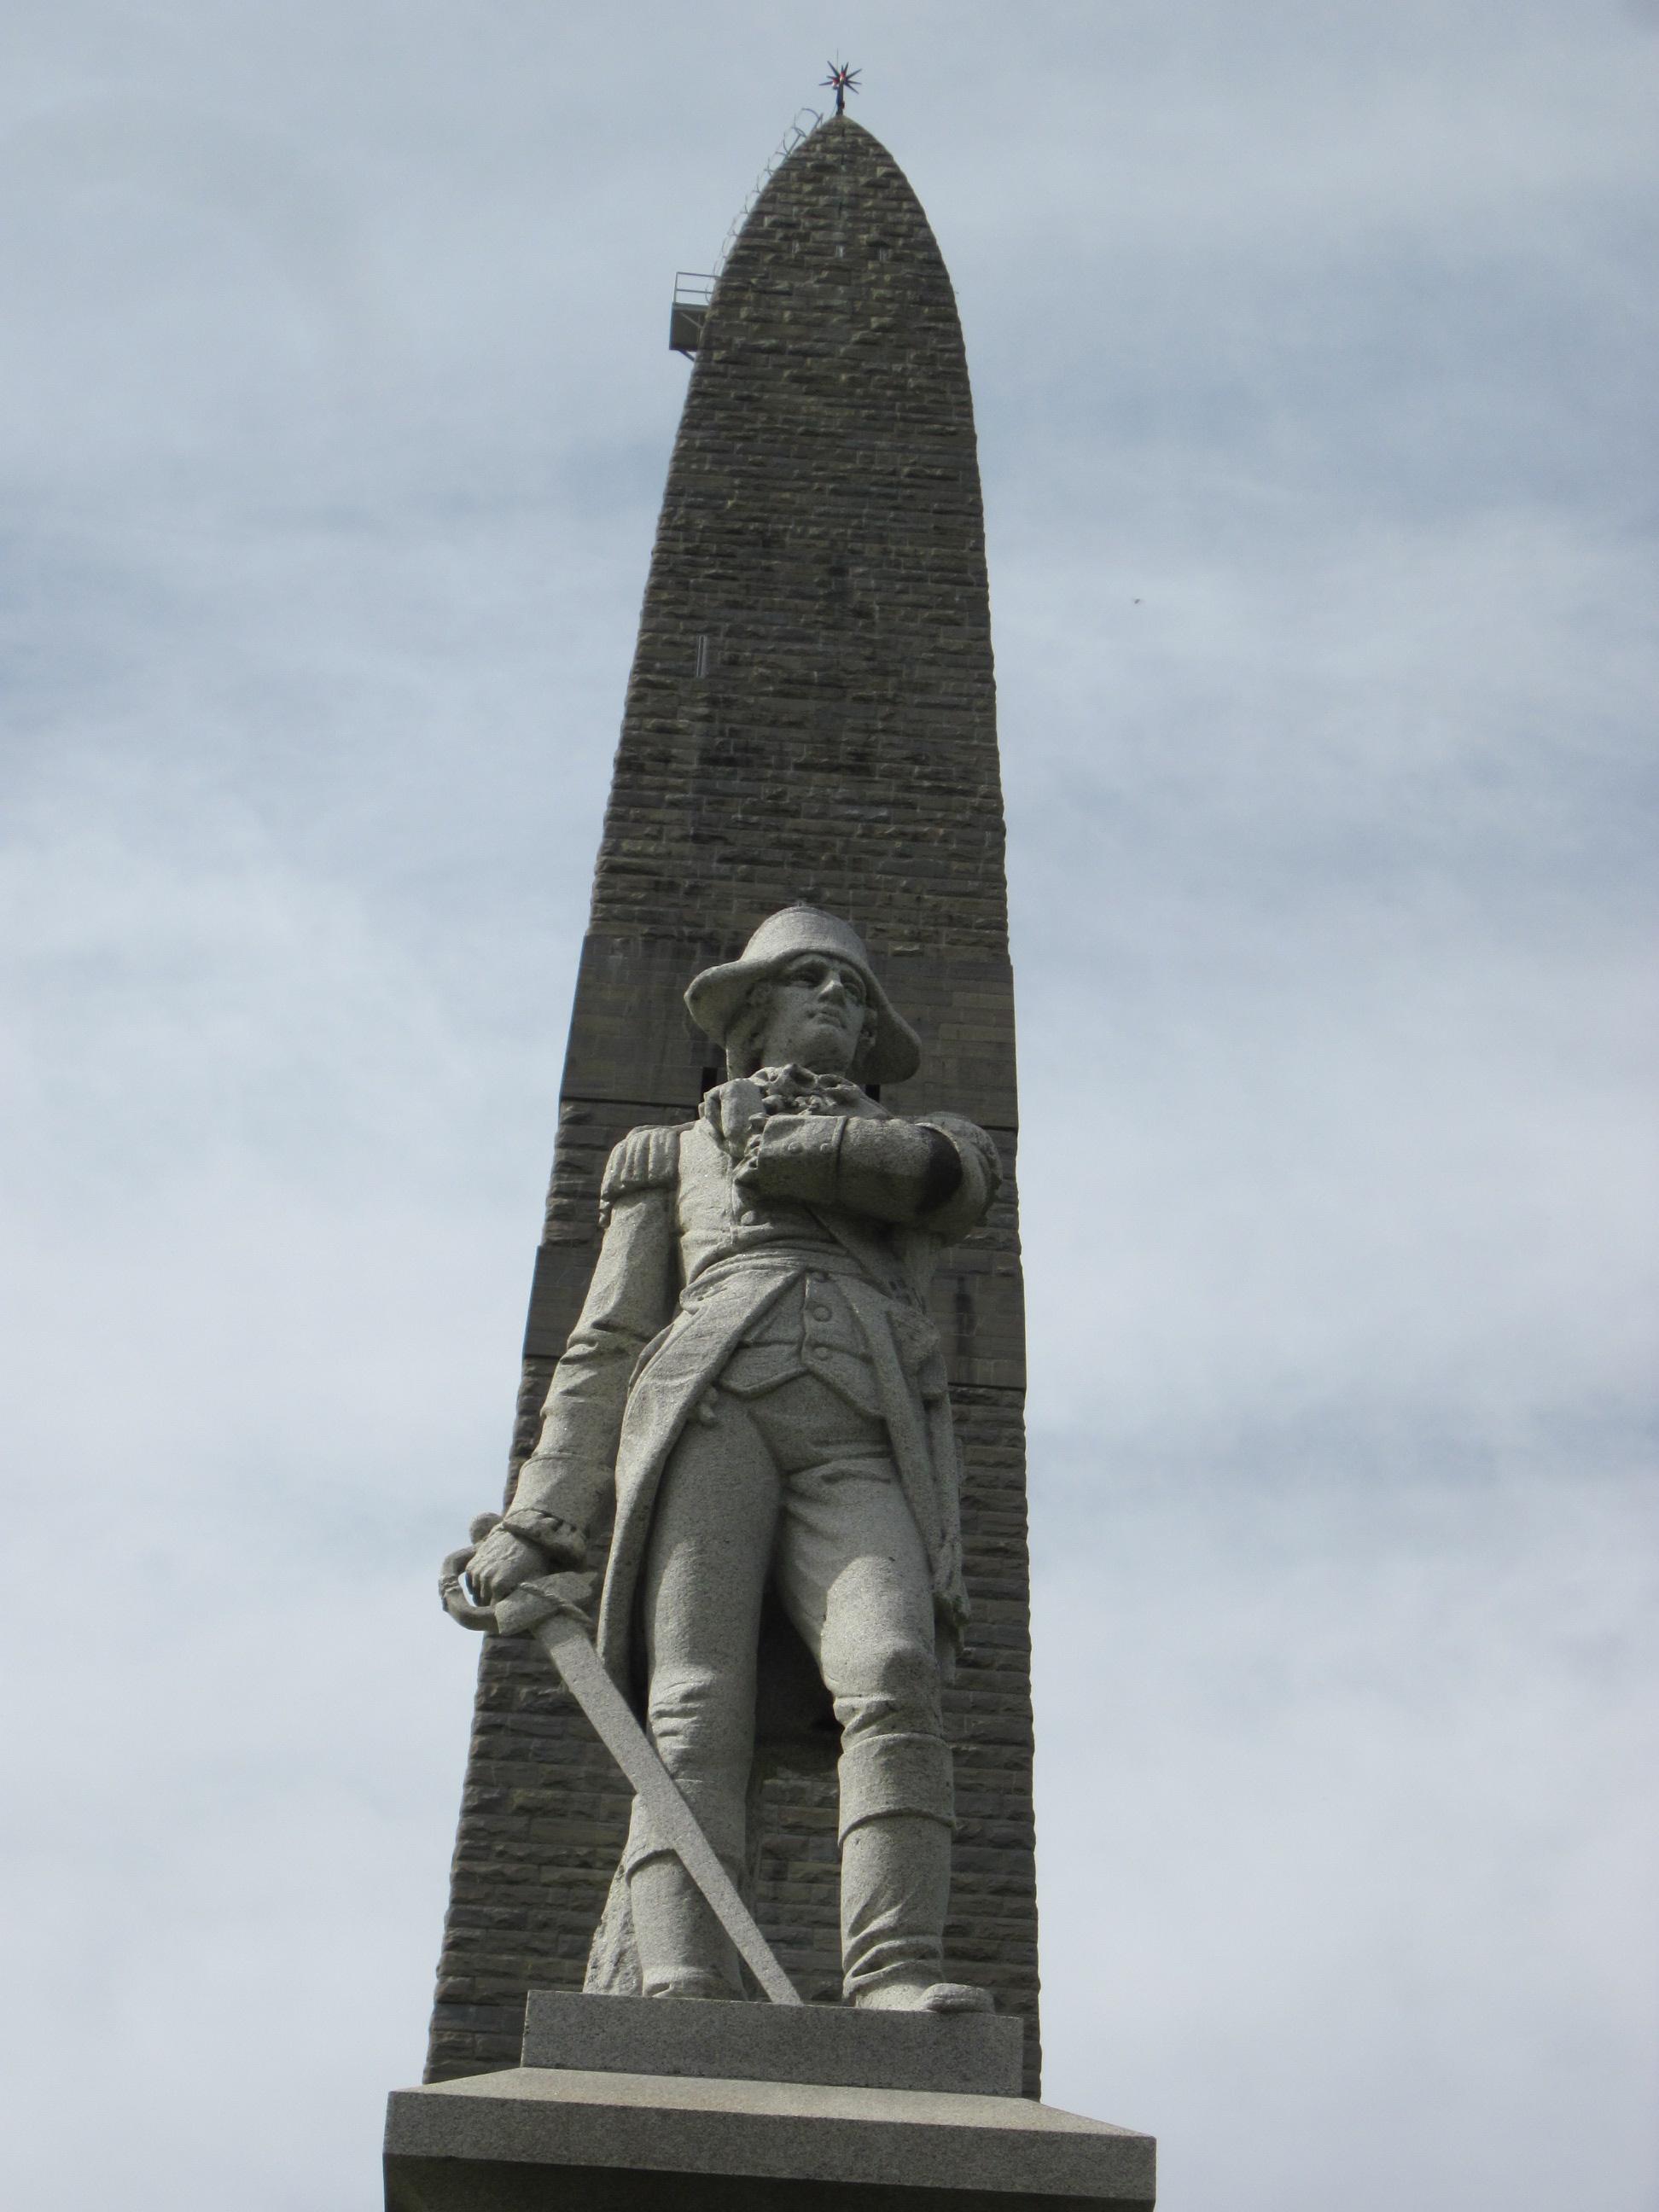 The Battle Monument in Bennington